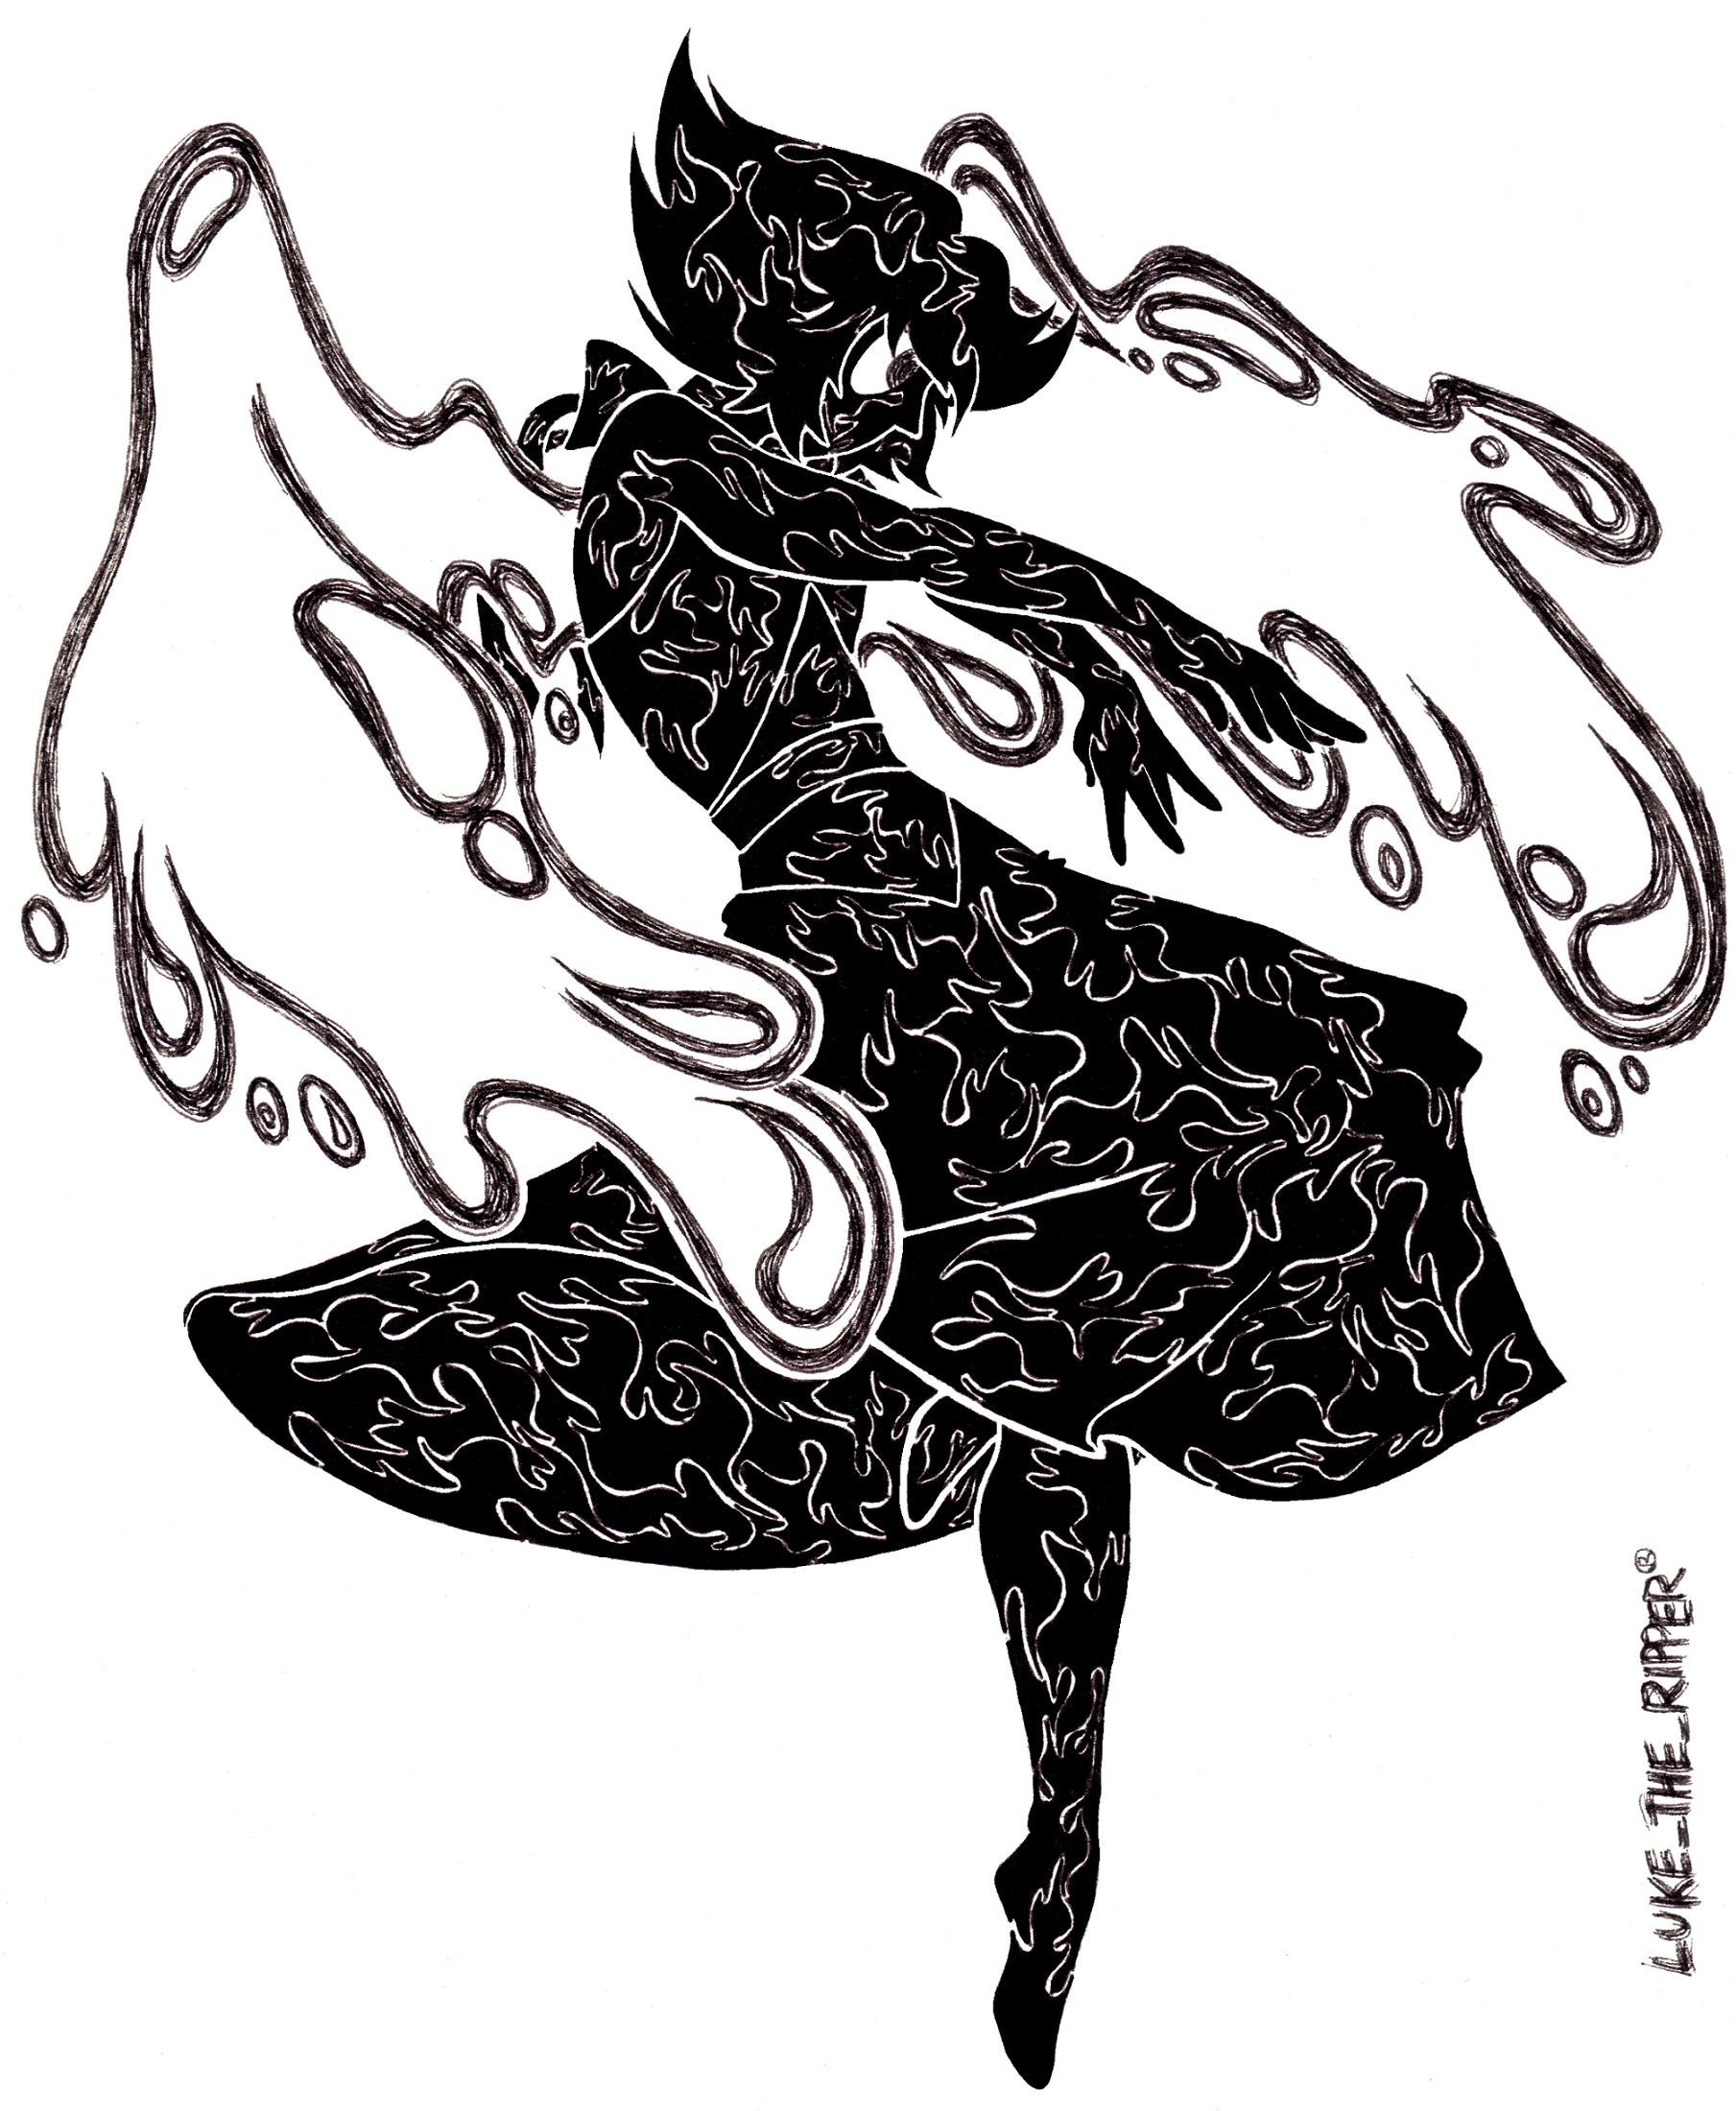 Blackened Lapis by LukeTheRipper